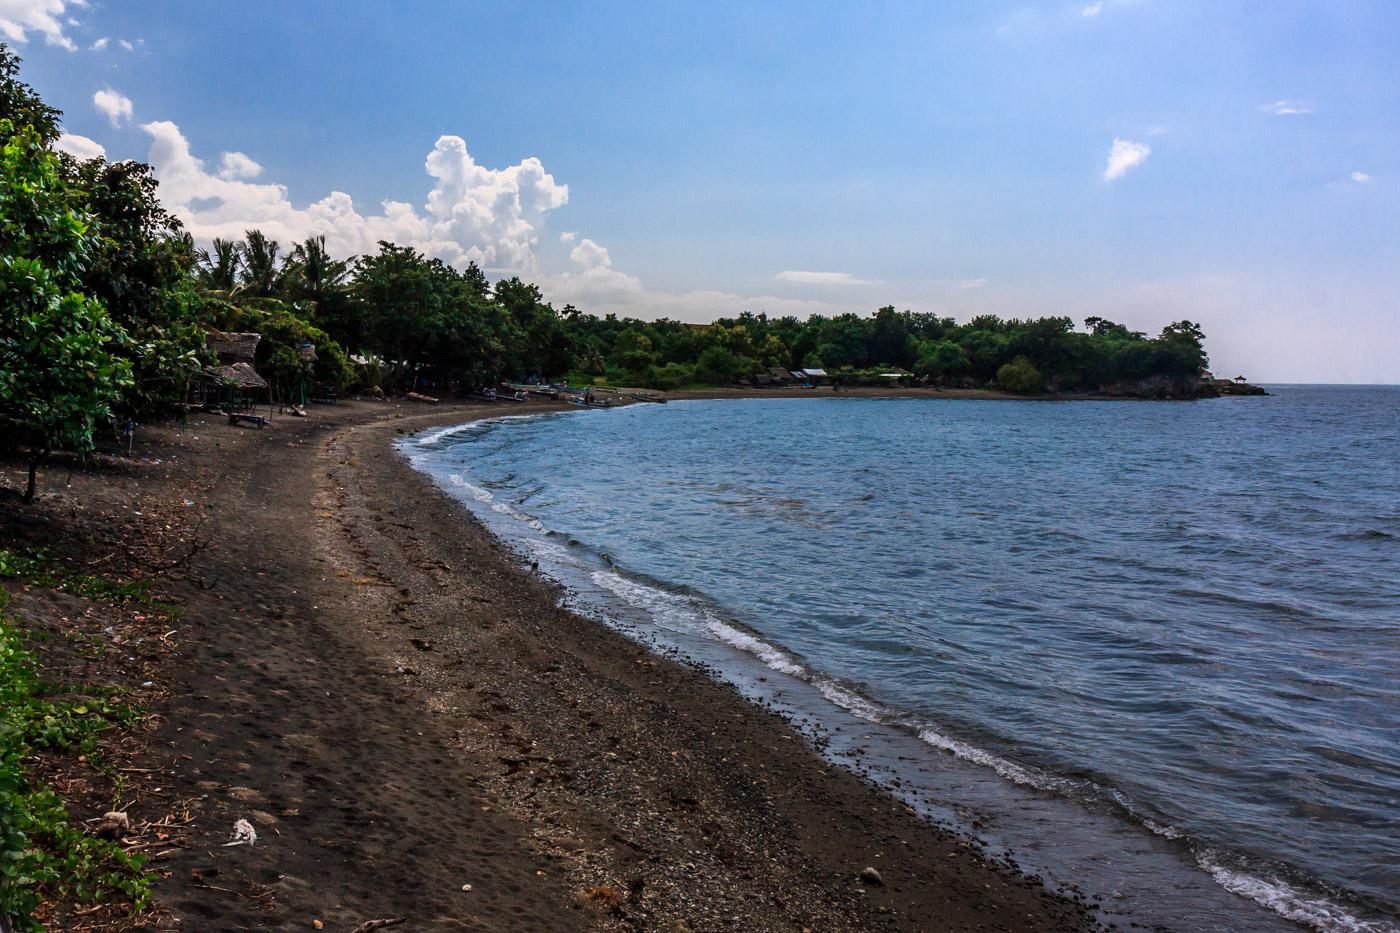 I had this beach to myself.